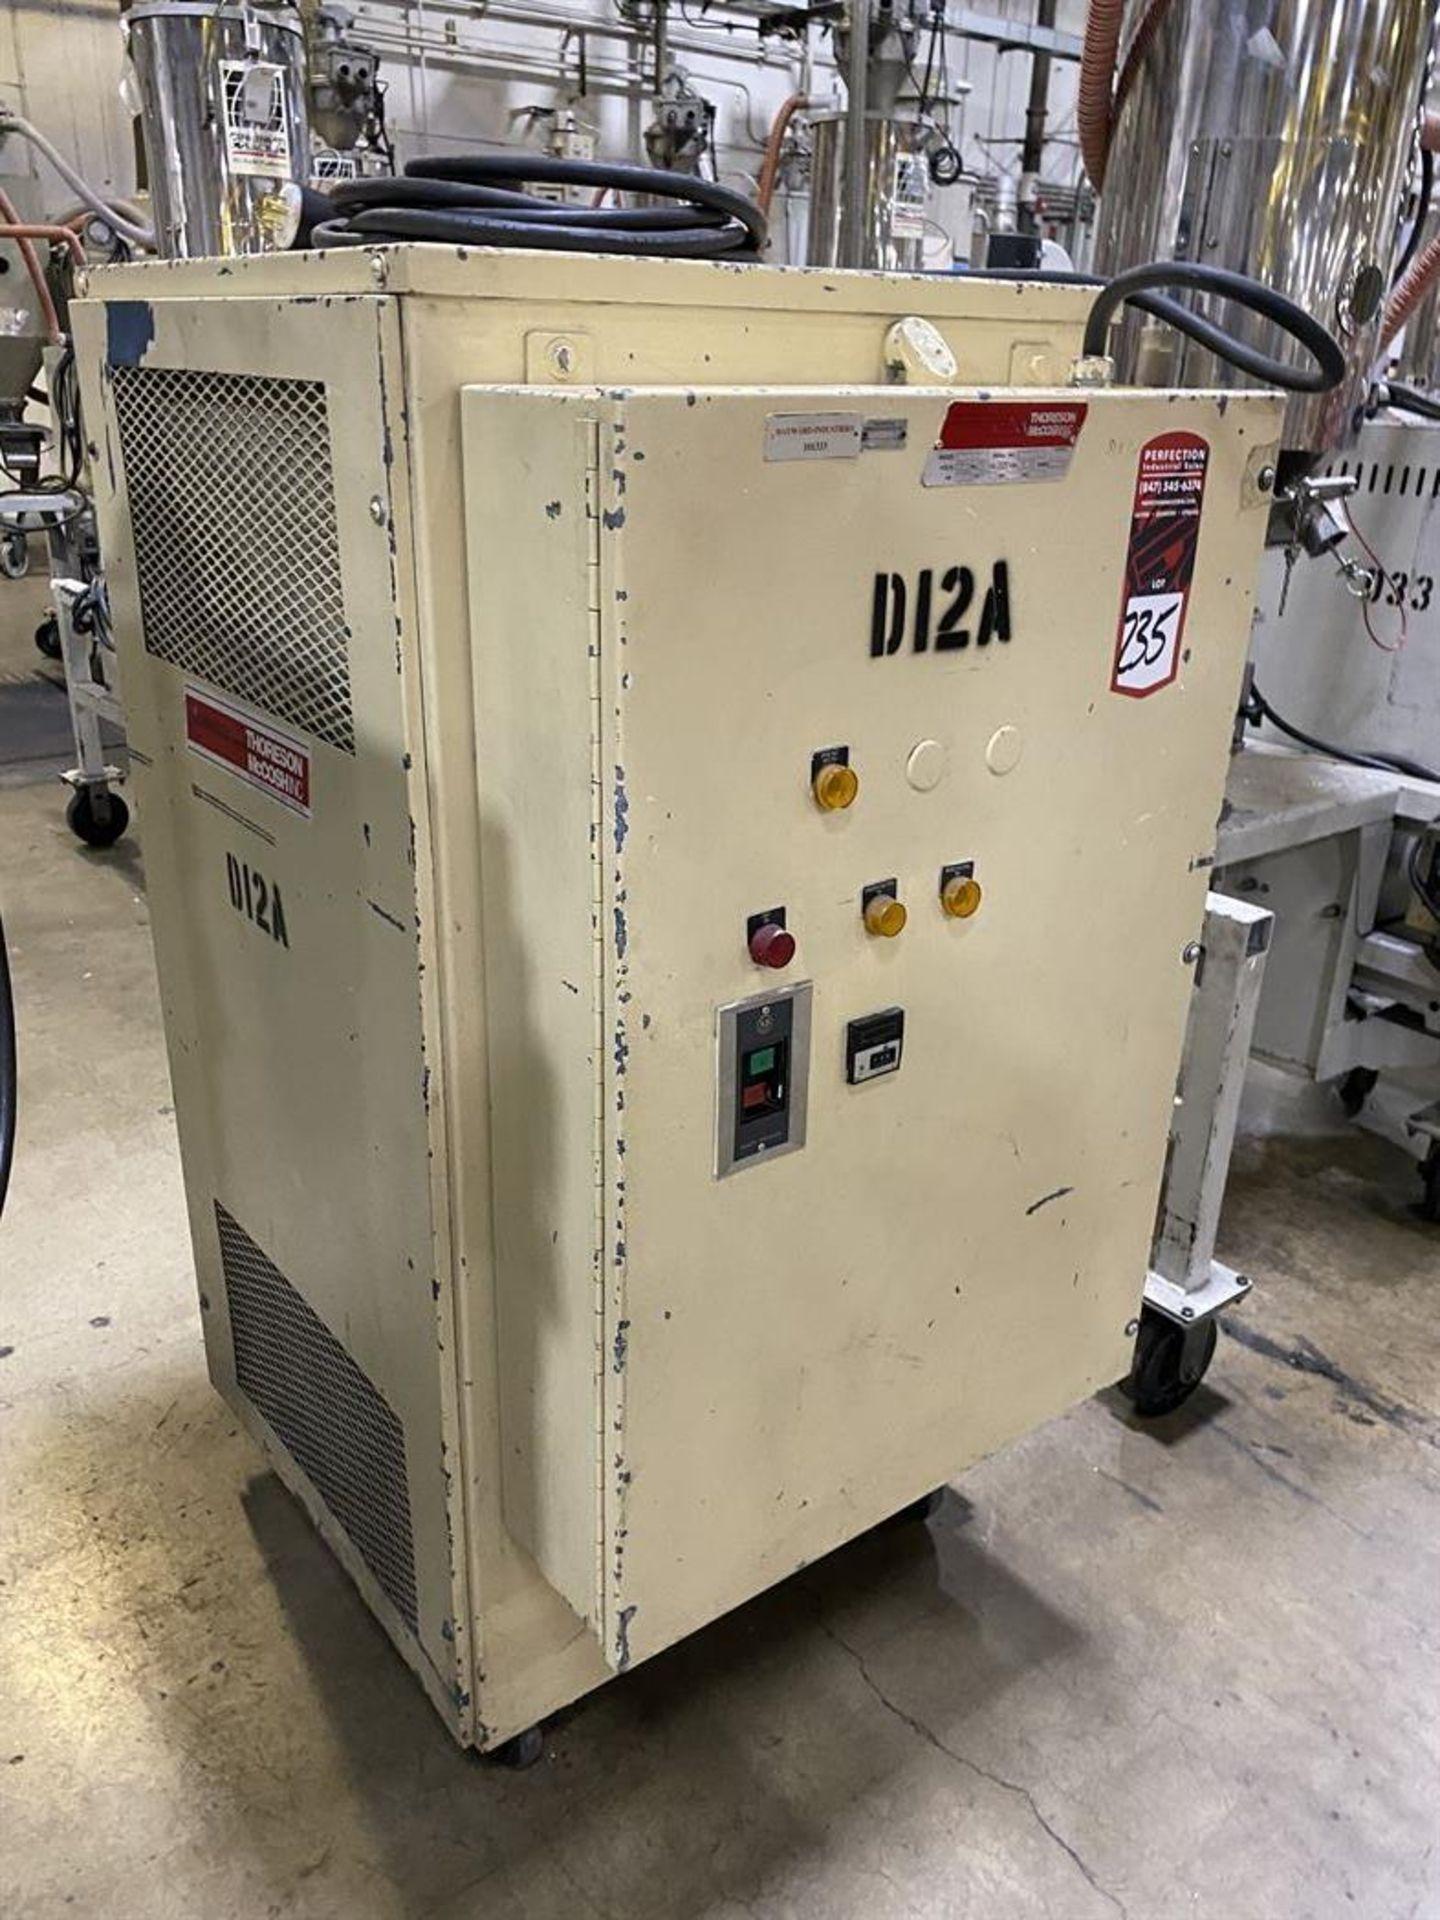 Lot 235 - Thoreson McCosh TD40 Dryer, s/n 8709088